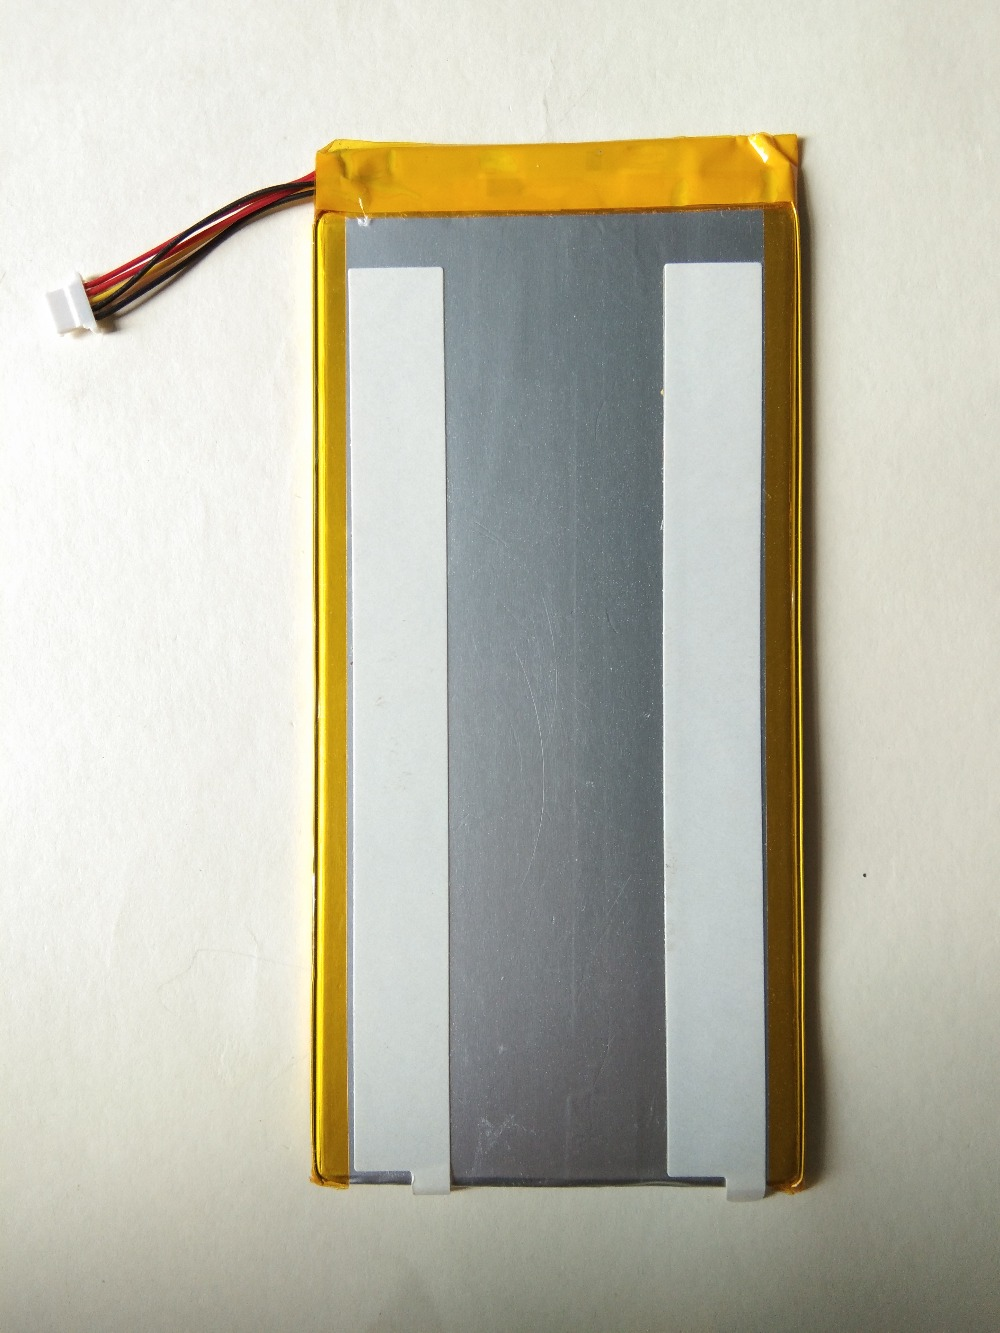 Battery 4600mAh PR-2874E9G for Acer A6001, Iconia One 8 B1-850